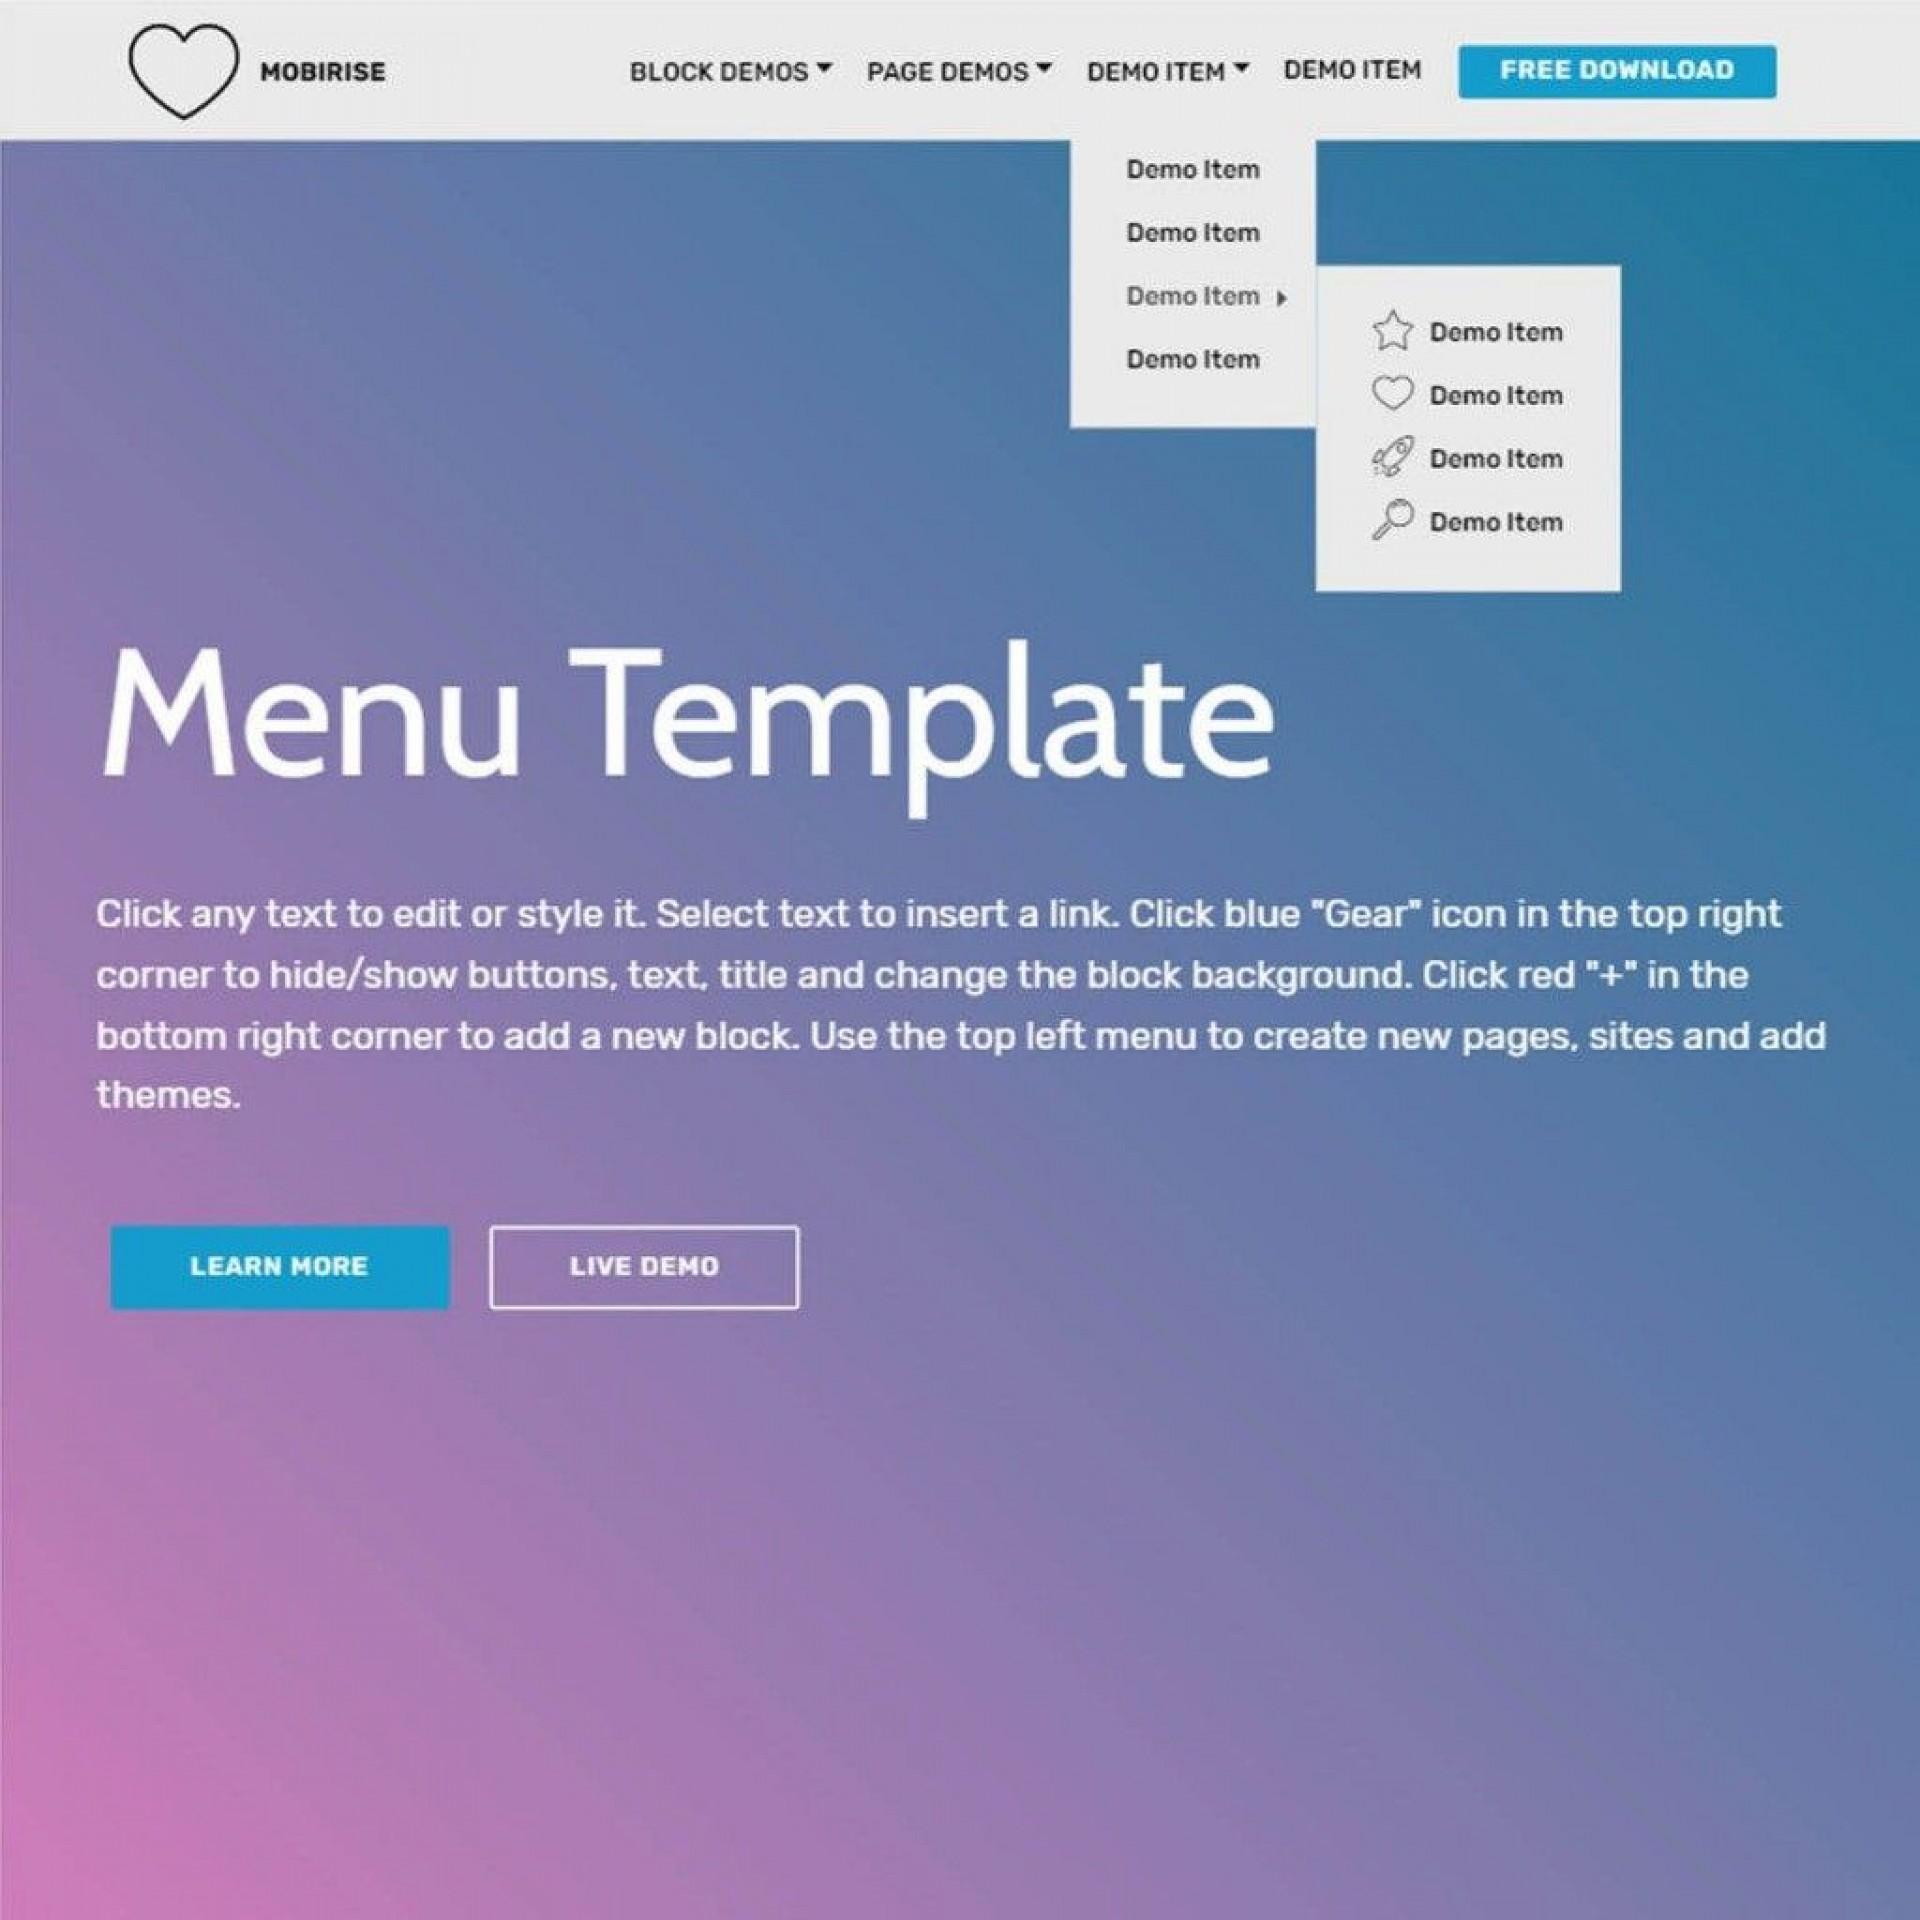 000 Striking Web Page Design Template In Asp Net High Resolution  Asp.net1920